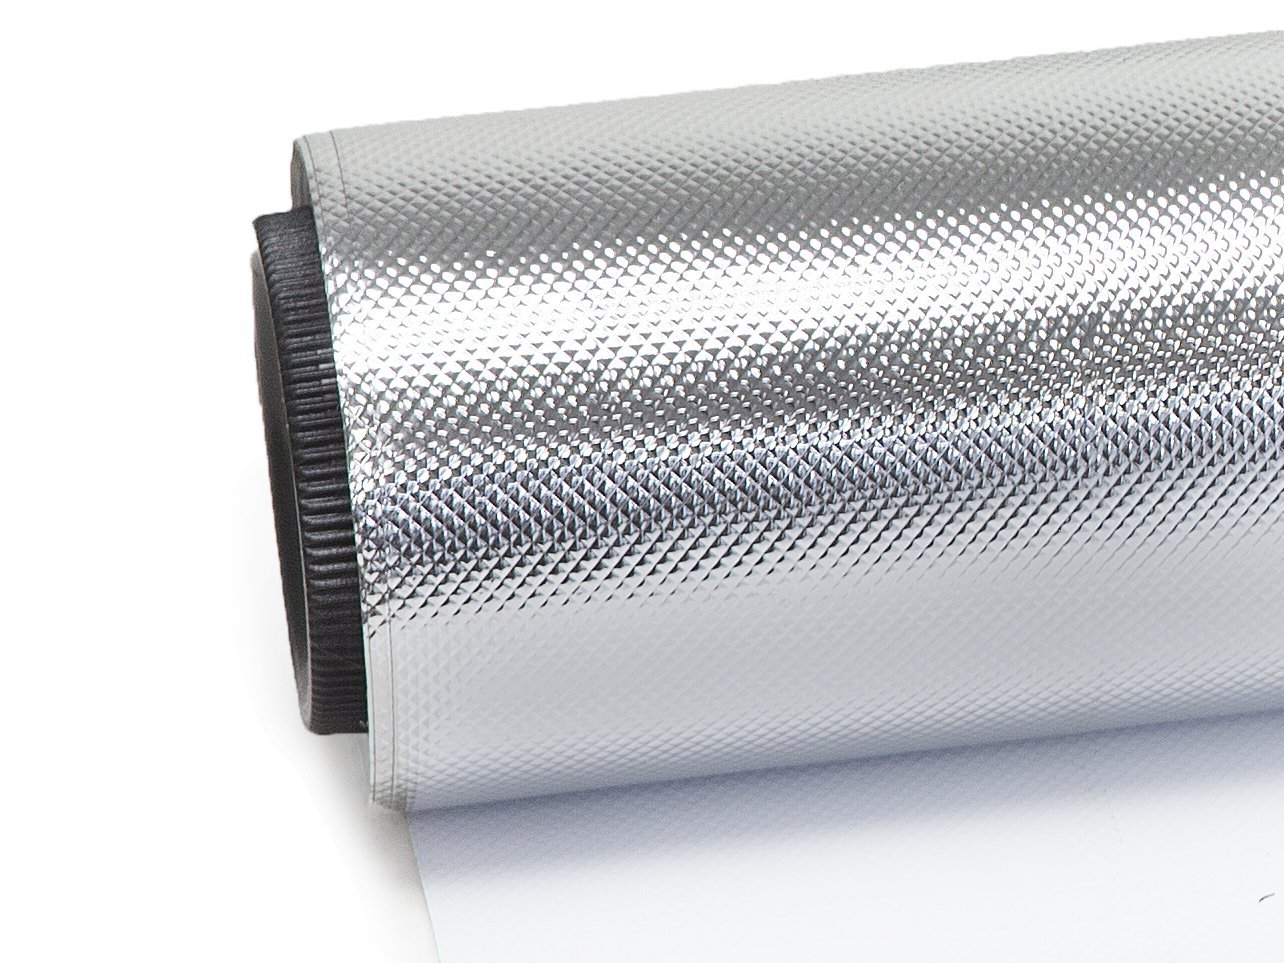 247Garden Diamond Silver Film Foil Roll Reflective Mylar Hydroponic (4 ft x 10 ft)